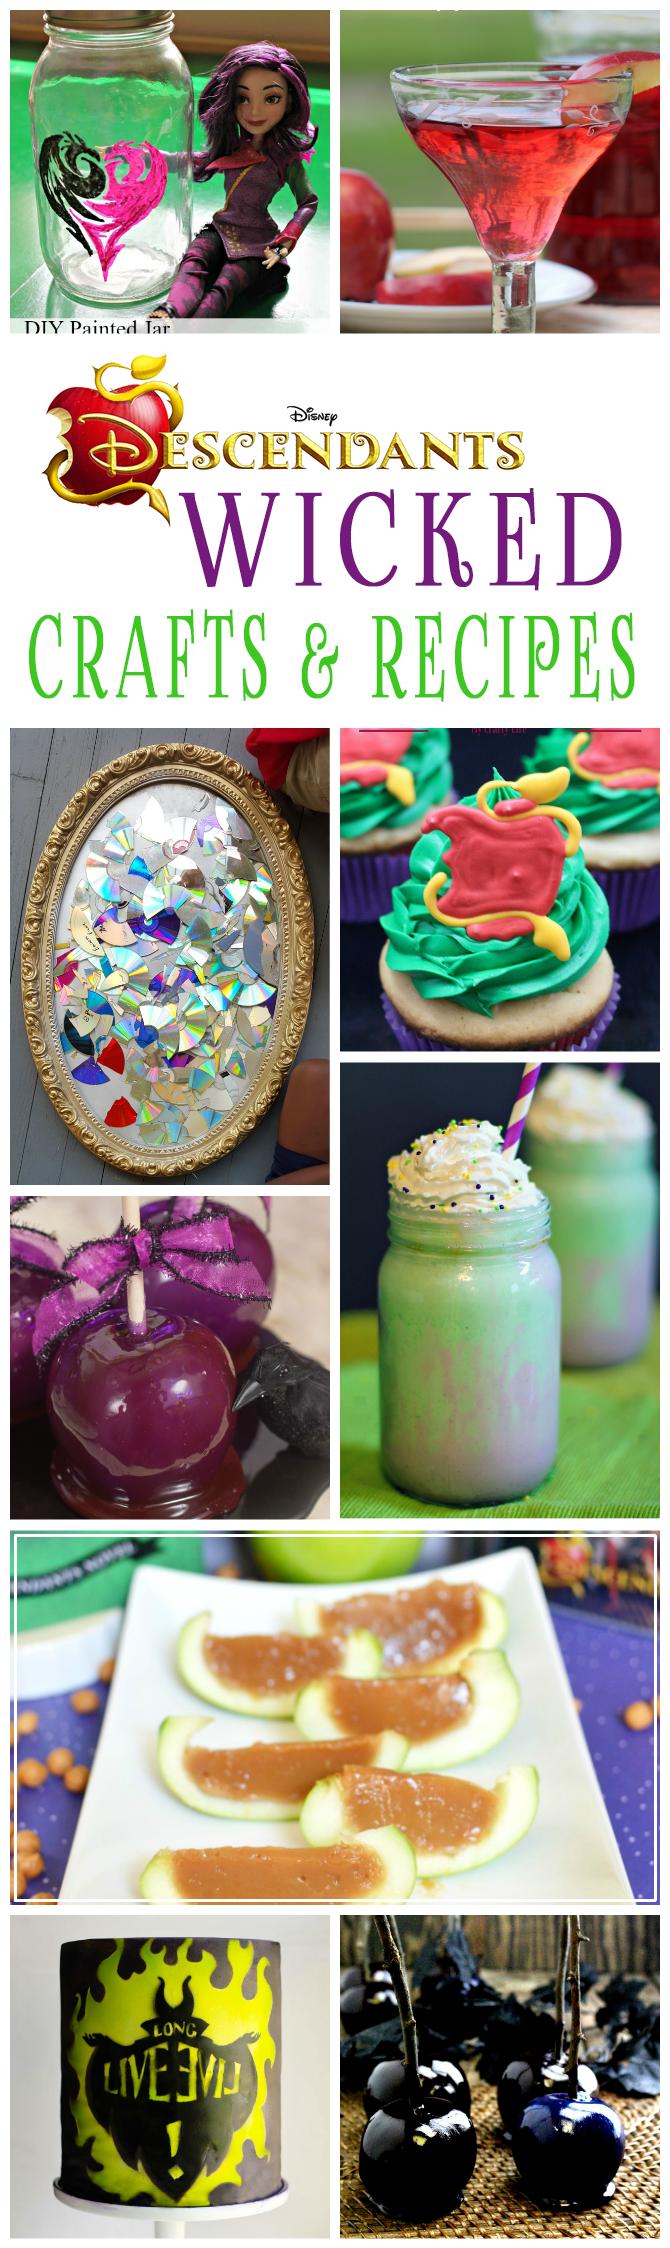 Birthday craft ideas for girls - 20 Wicked Disney Descendants Crafts And Recipes 9th Birthdaybirthday Party Ideasdisney